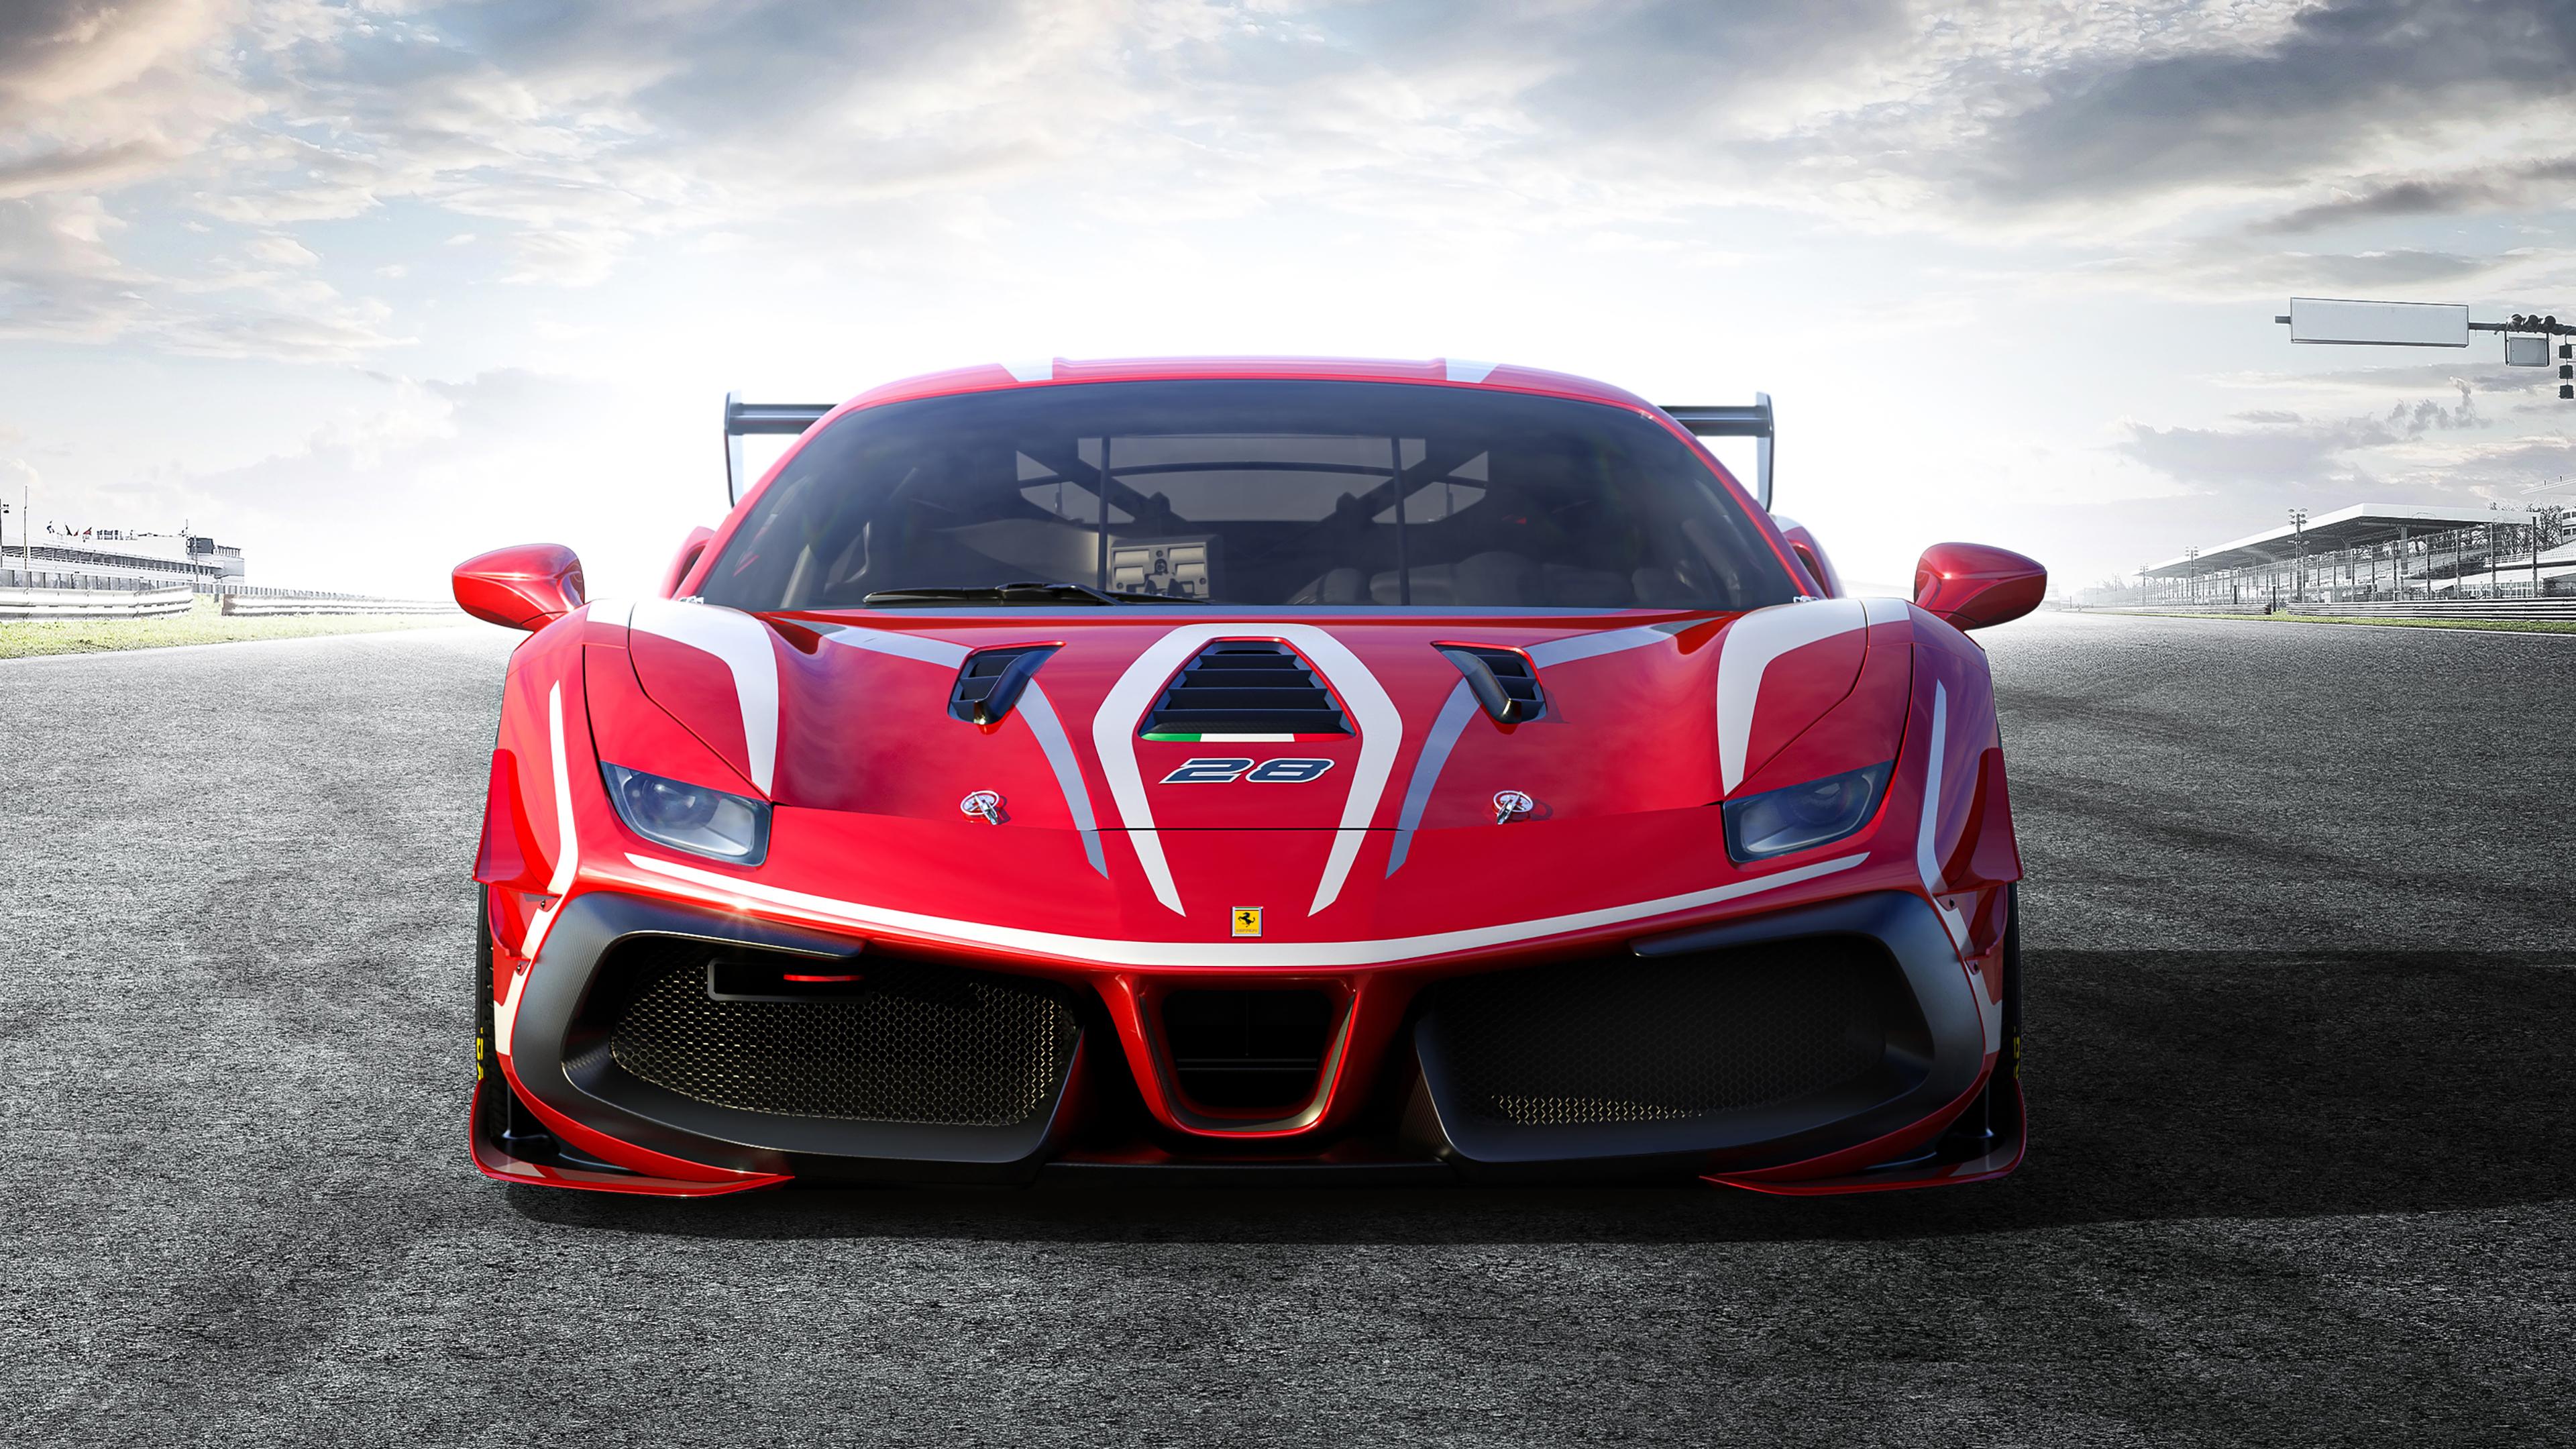 Ferrari 488 Challenge Evo 2020 4k Wallpaper Hd Car Wallpapers Id 13723